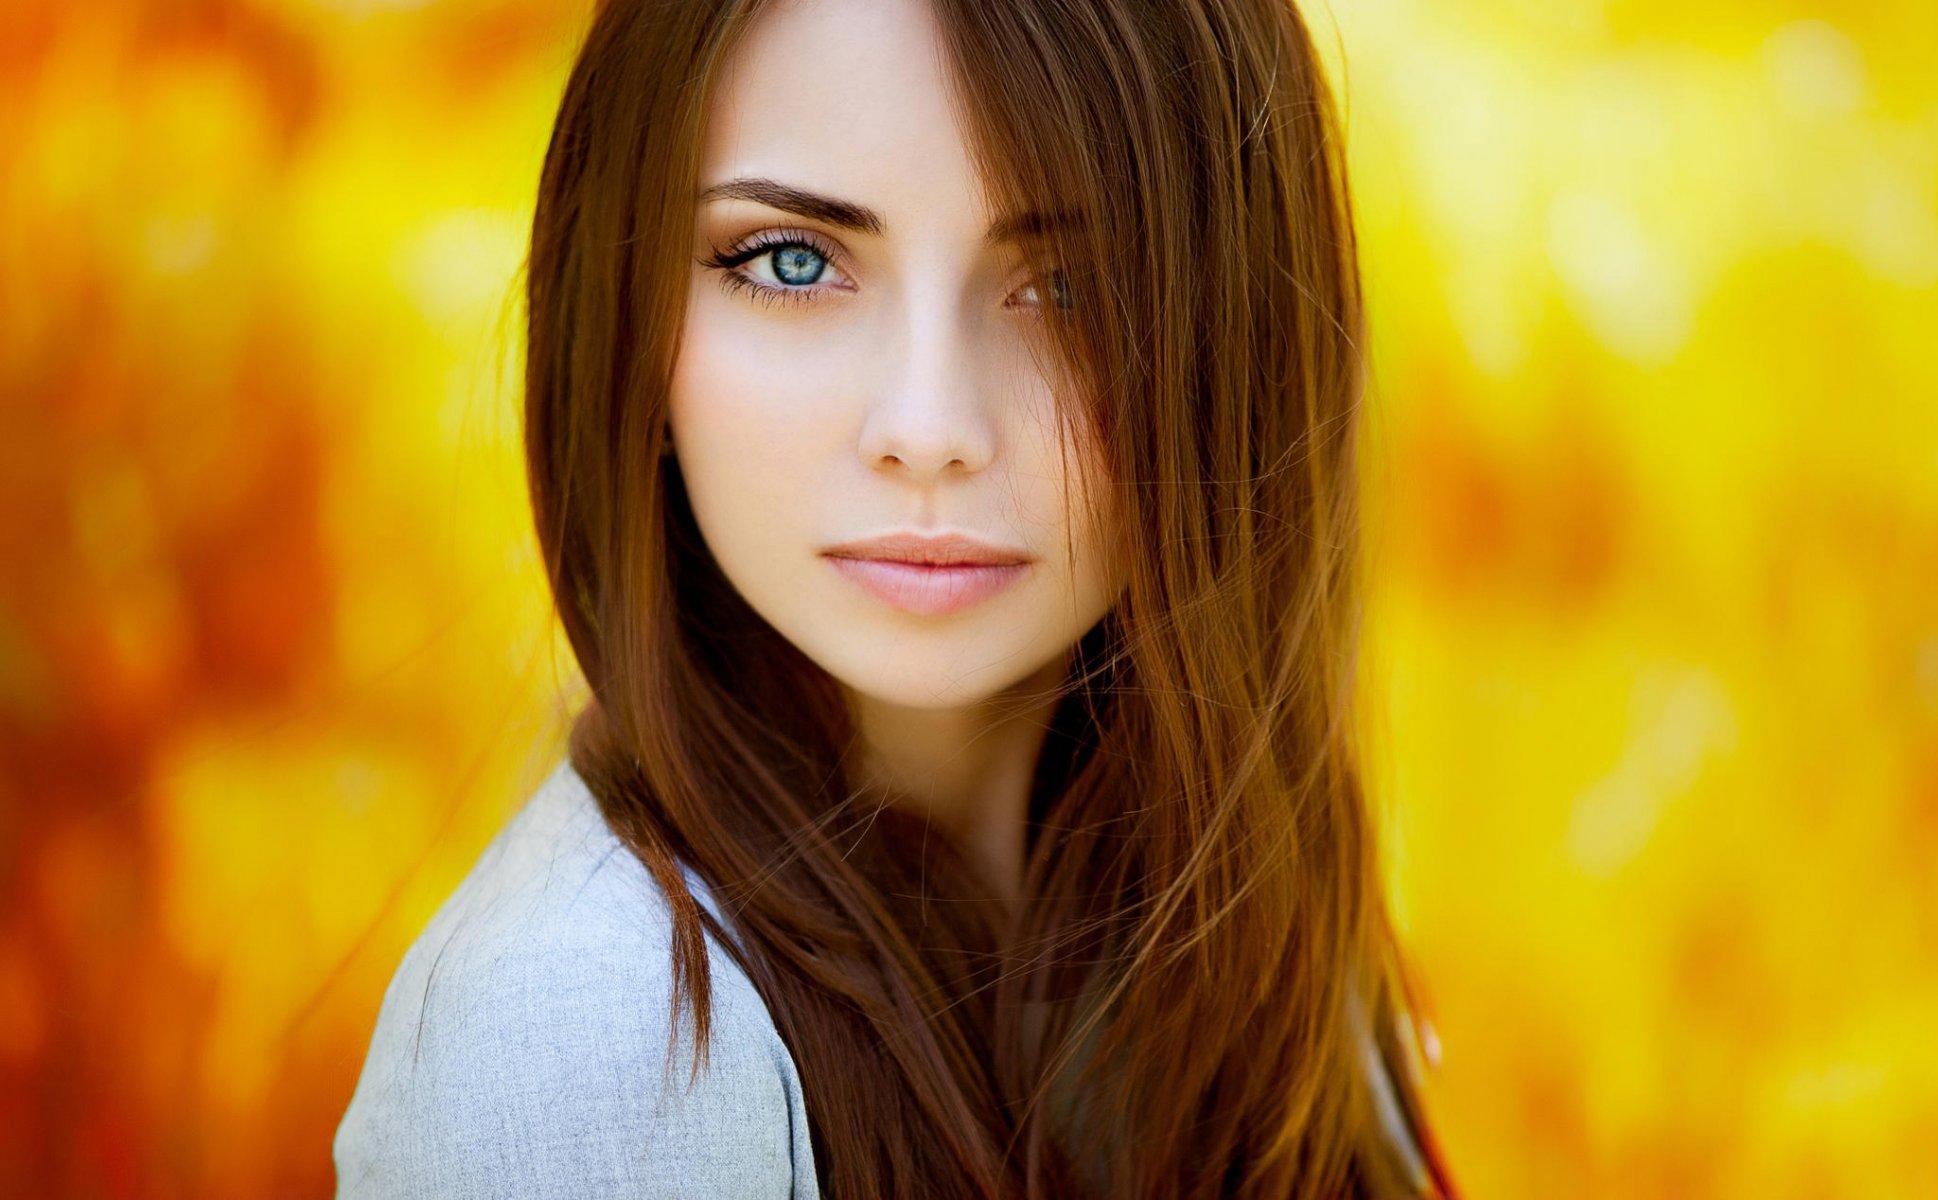 Красивые девушки шатенки, крупно русскую тетю